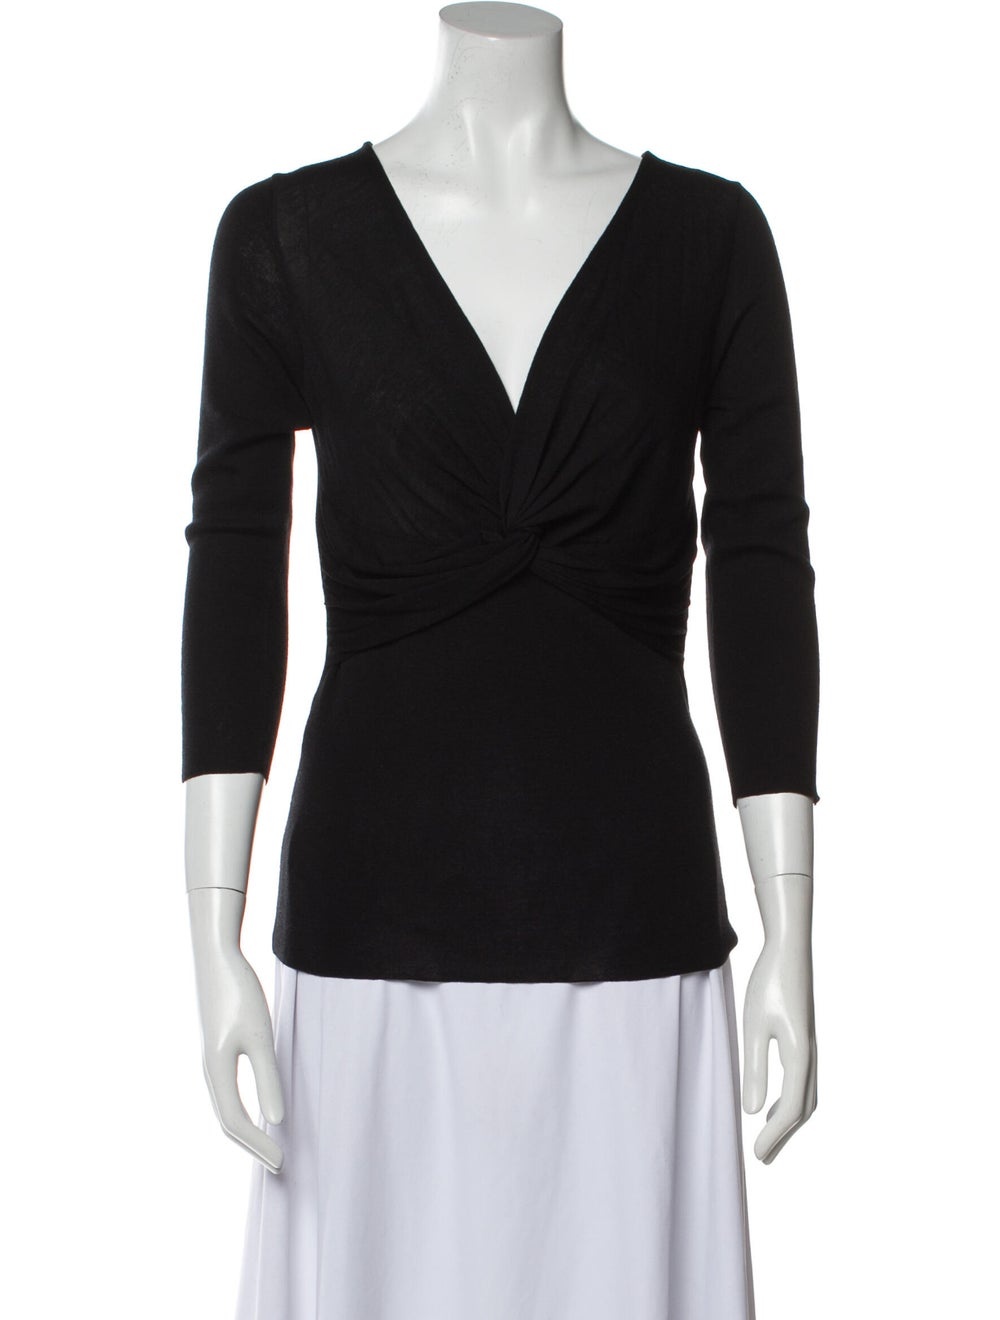 Prada Wool V-Neck Top Wool - image 1